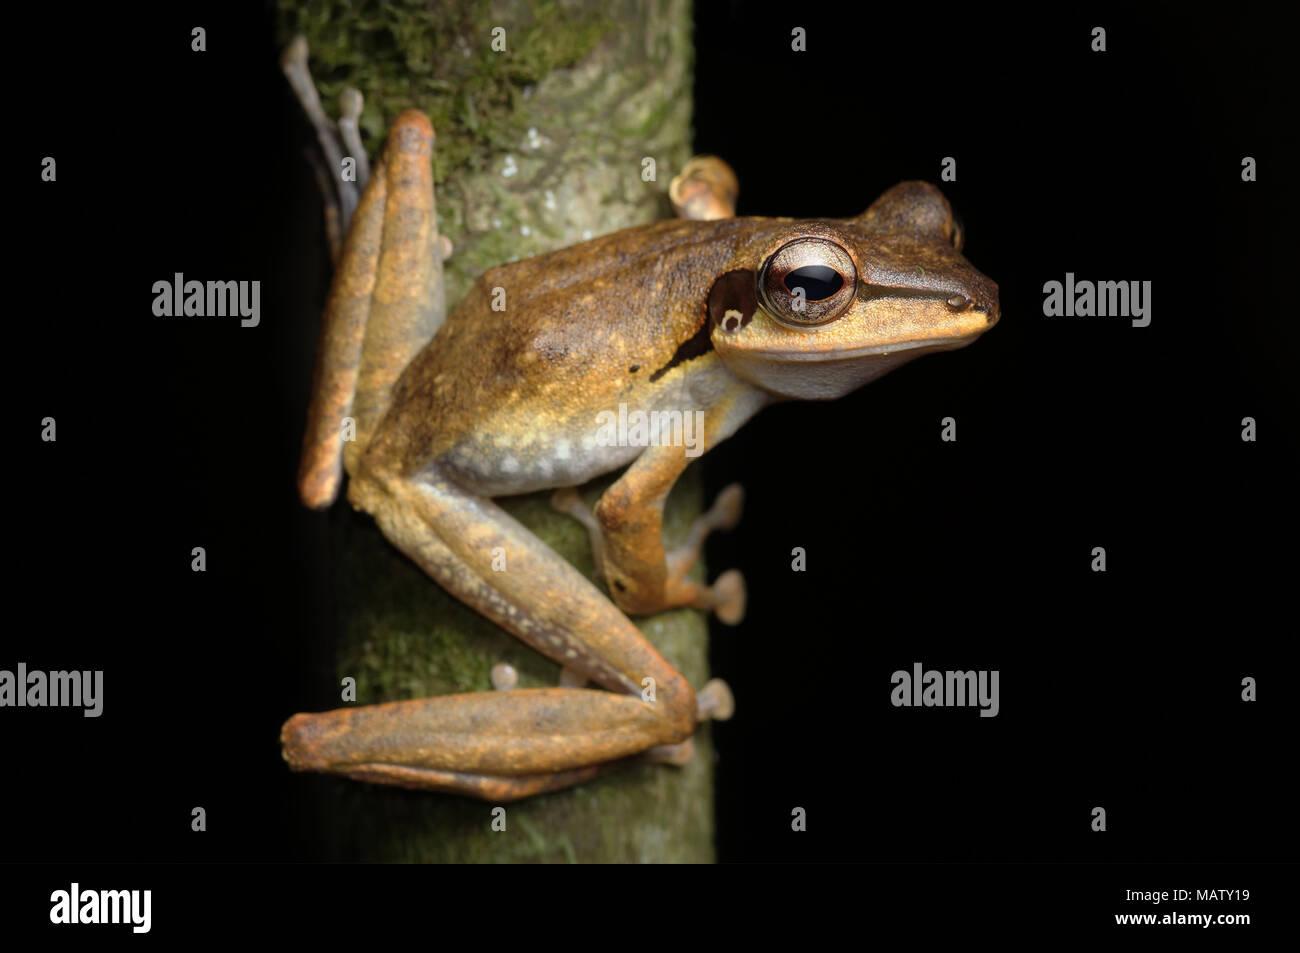 Dark eared tree frog Polypedates macrotis - Stock Image